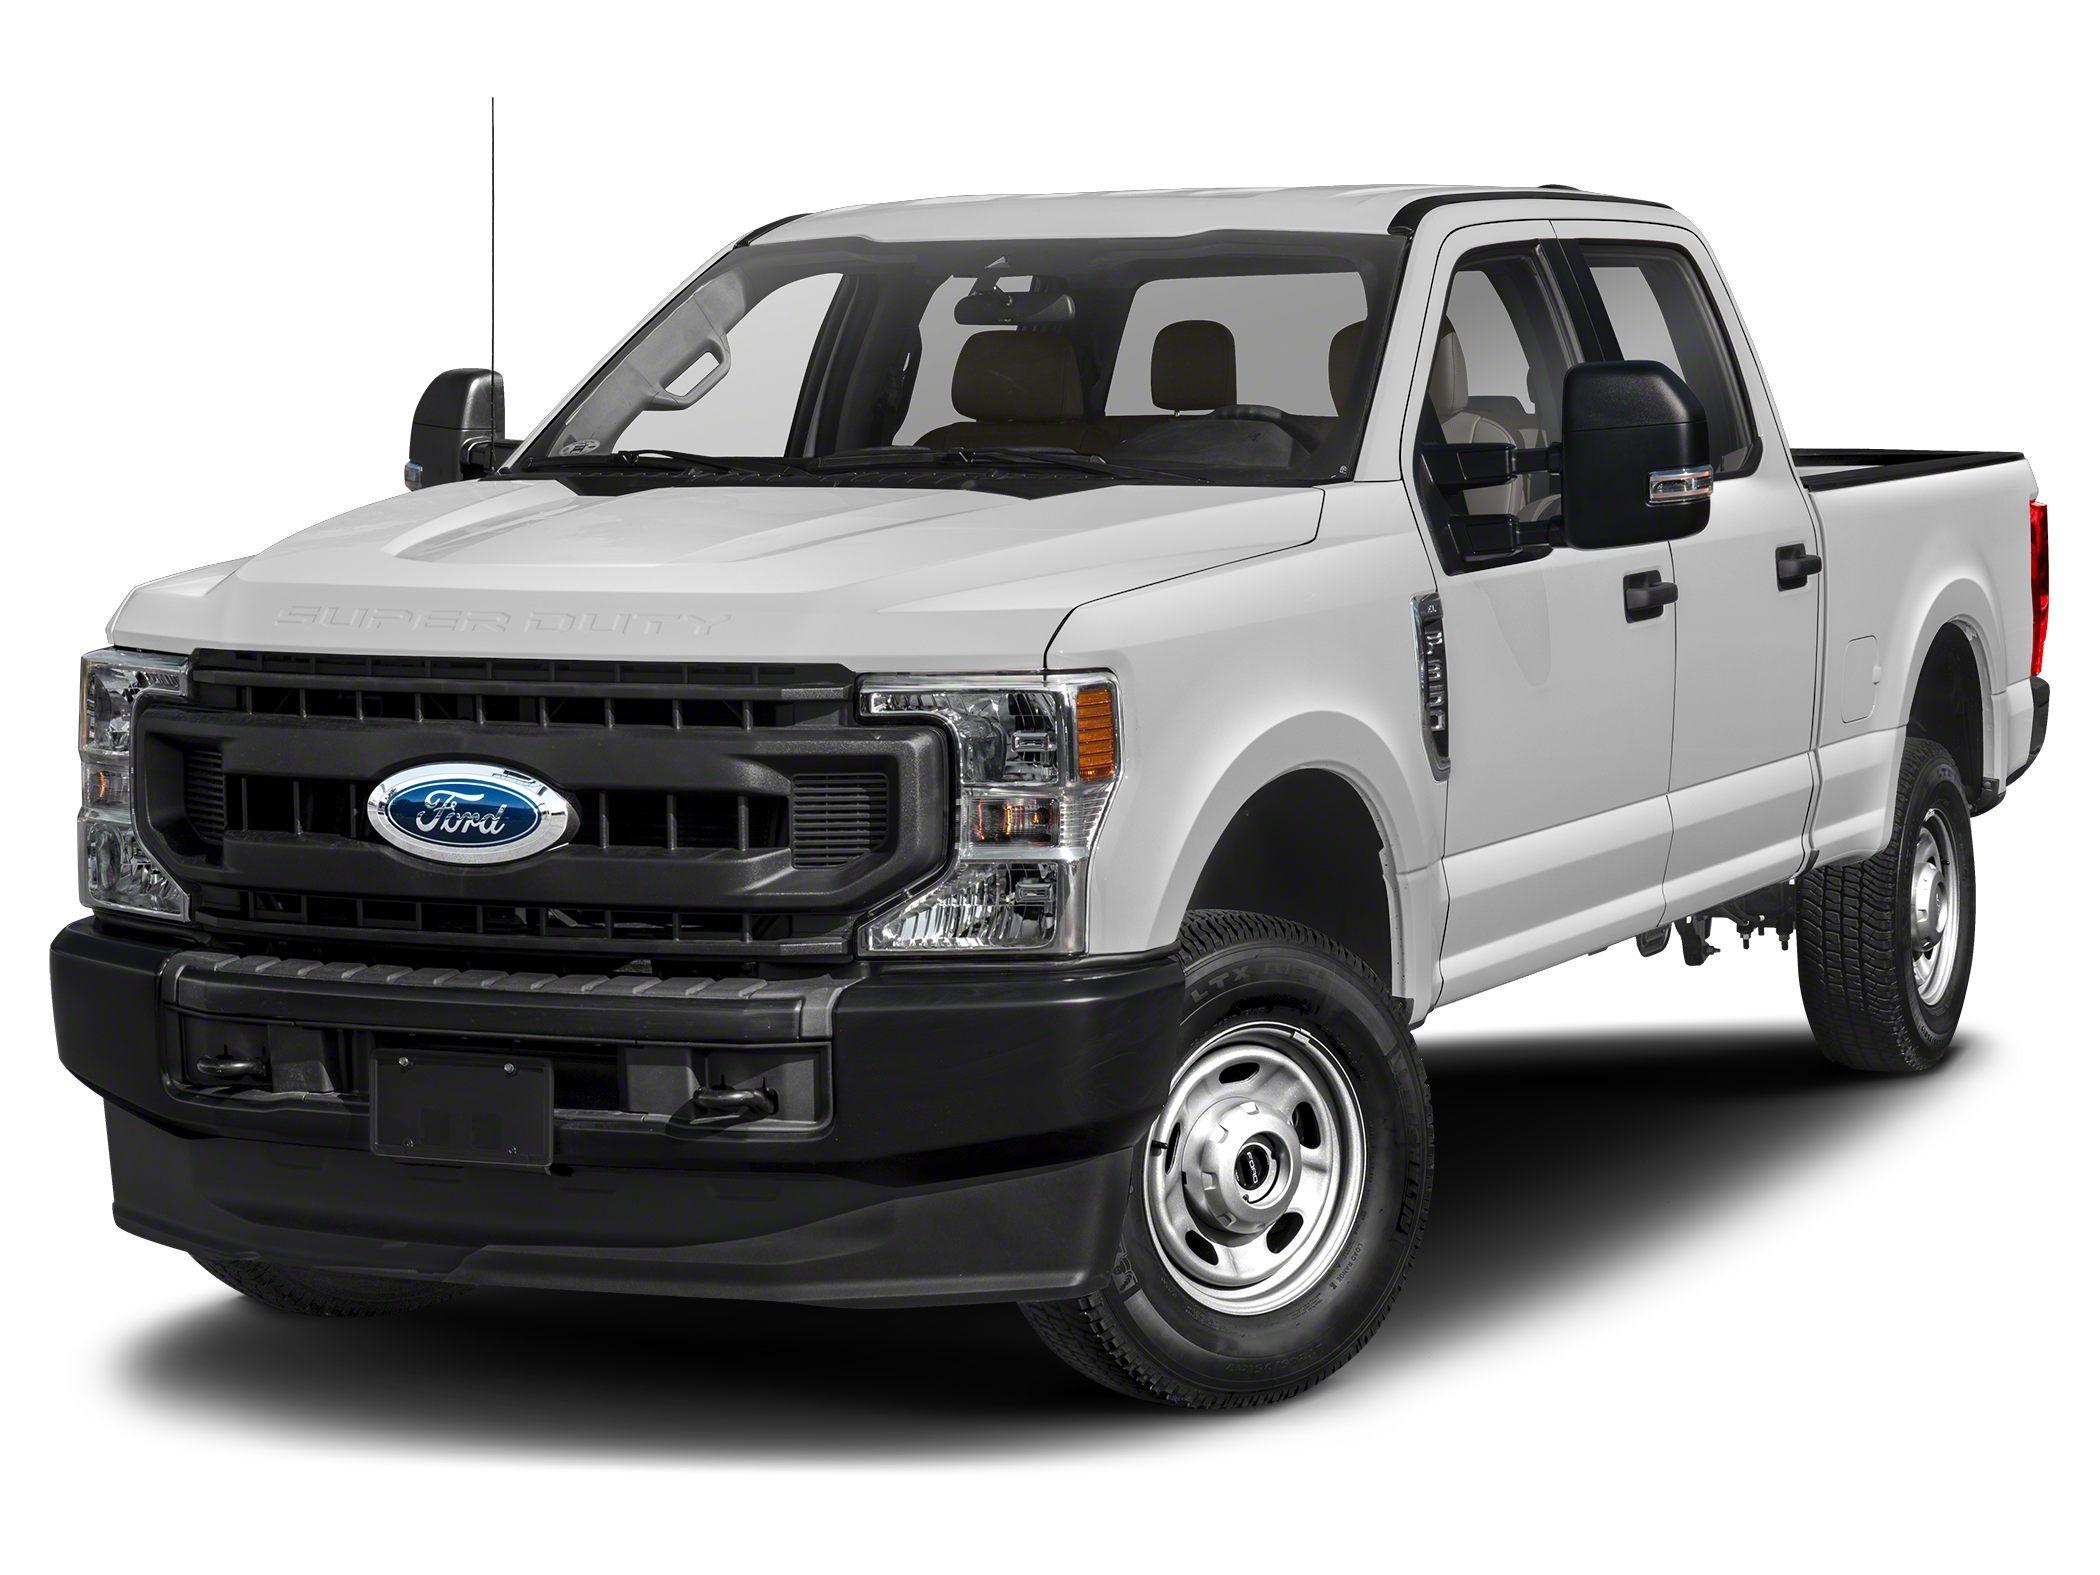 2022 Ford F-350 Truck